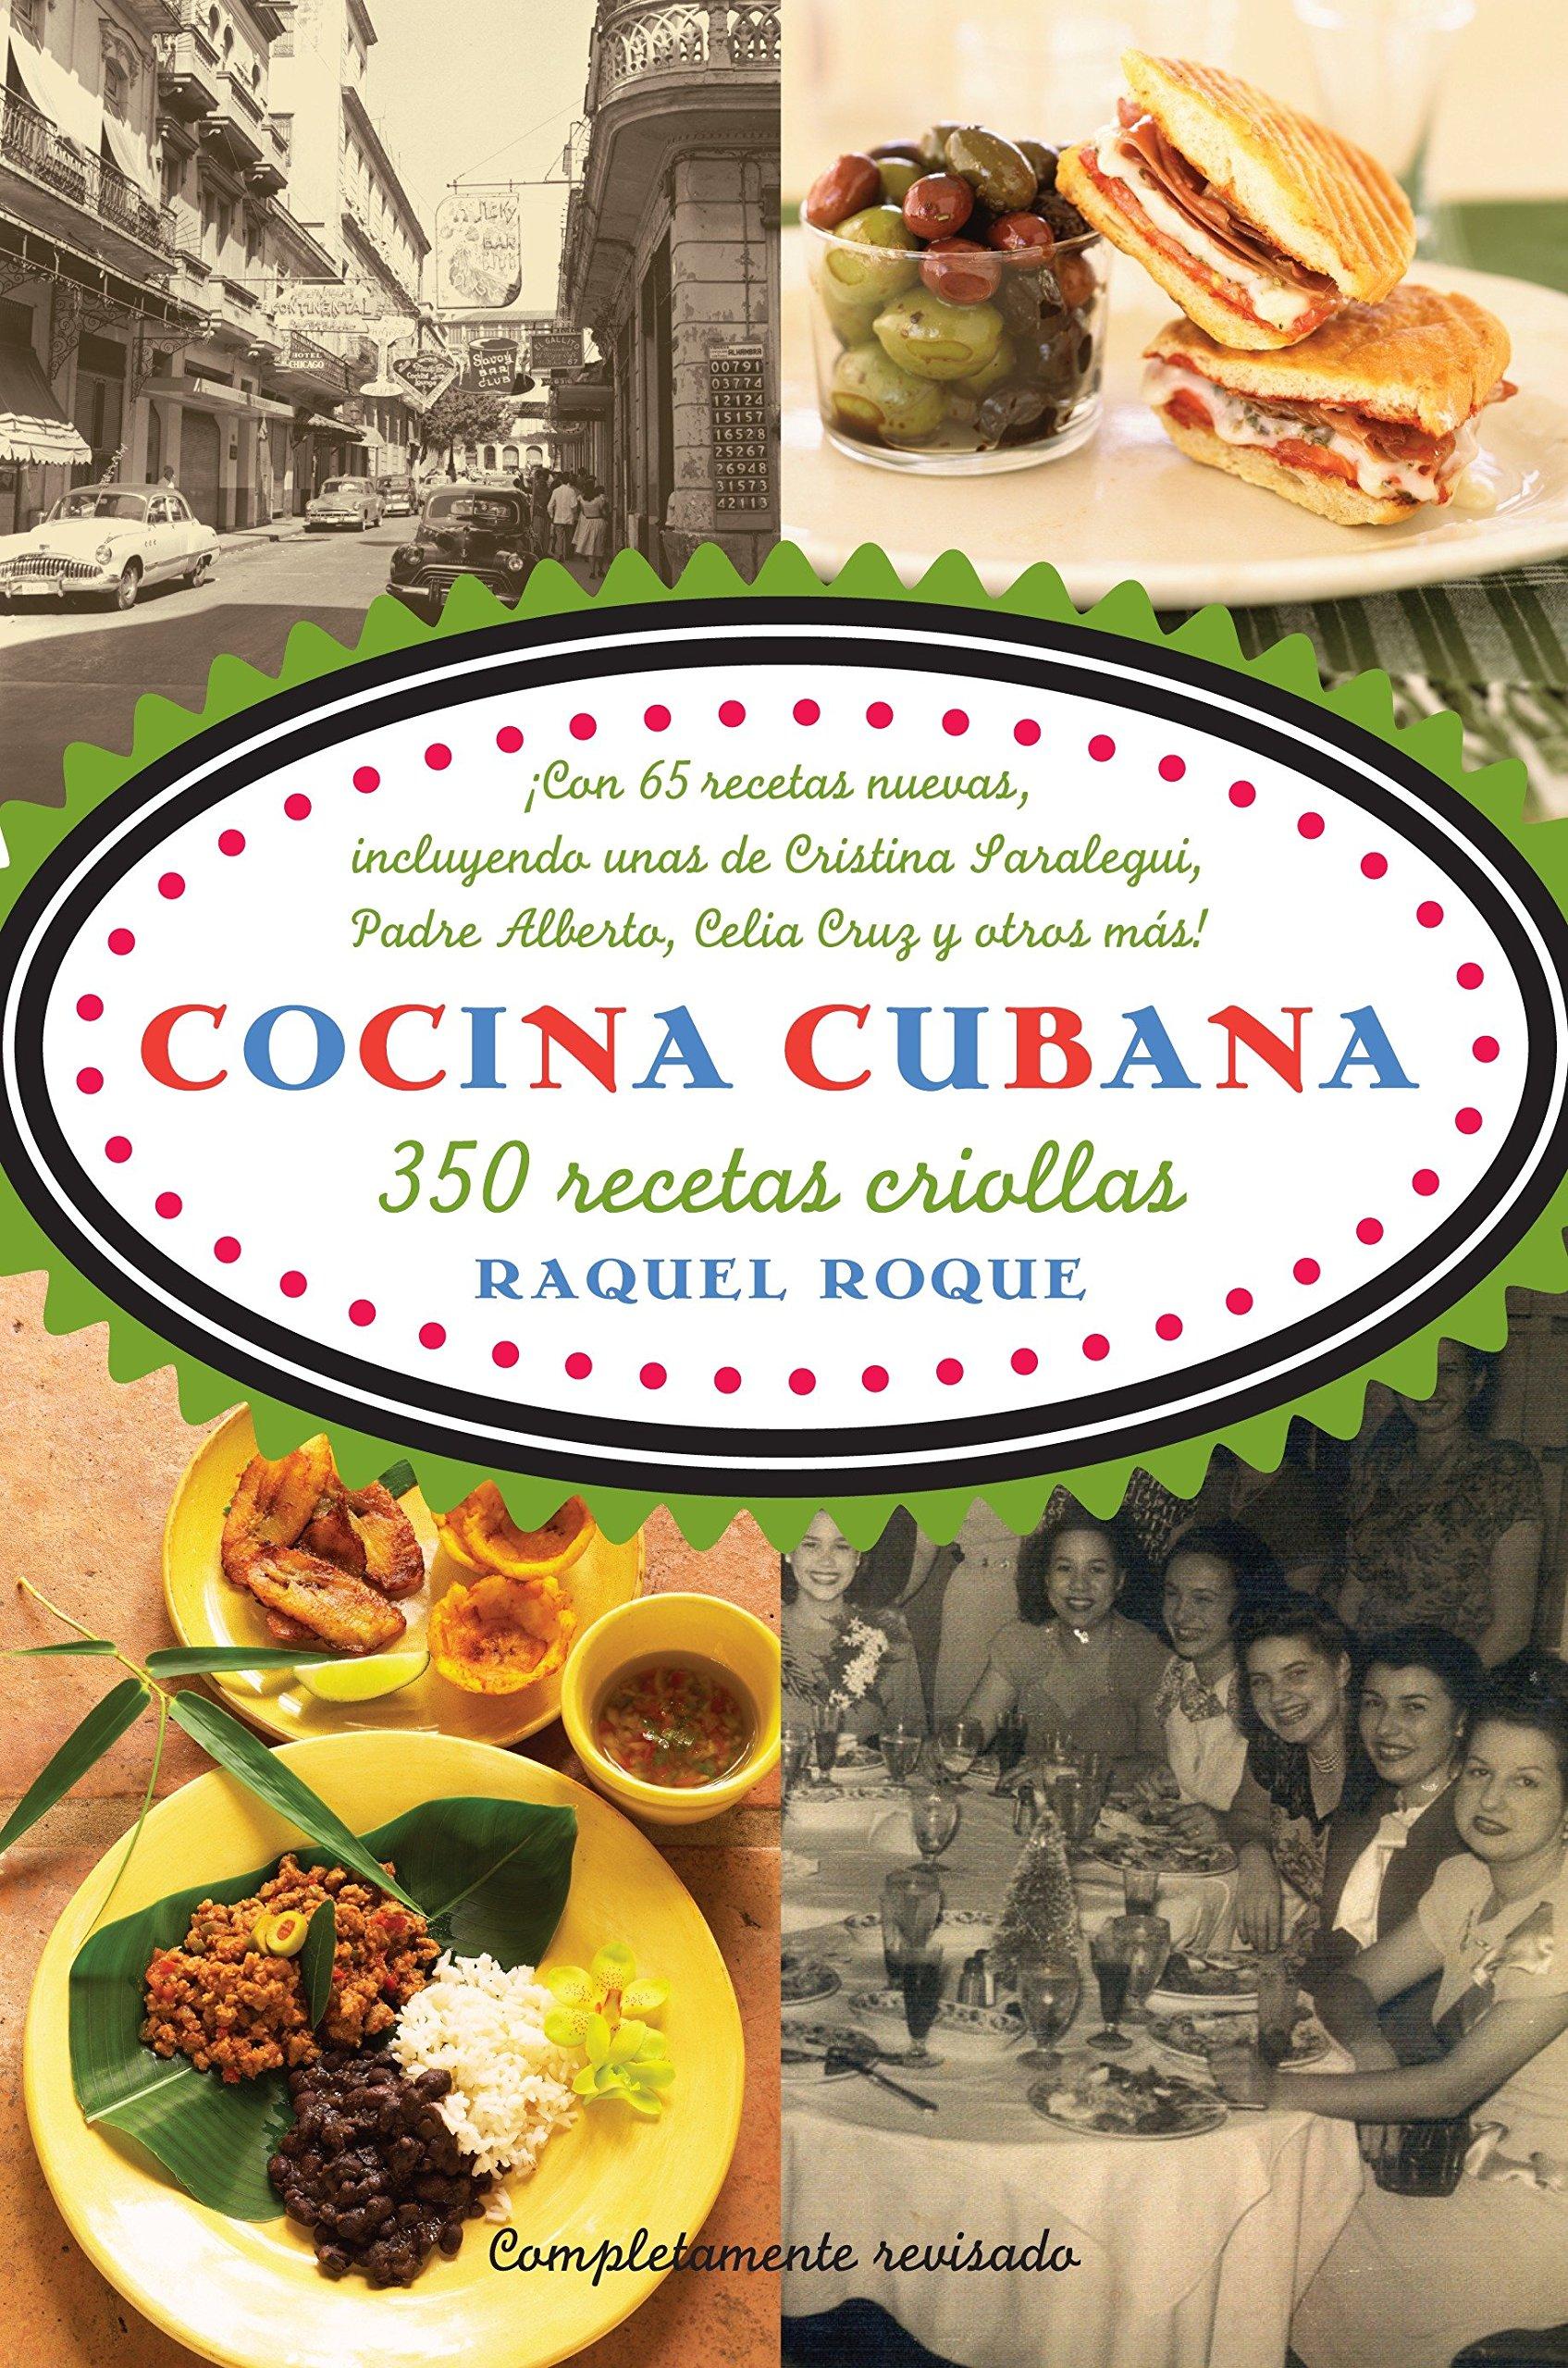 Cocina cubana: 350 recetas criollas (Spanish Edition): Raquel Roque: 9780307386014: Amazon.com: Books